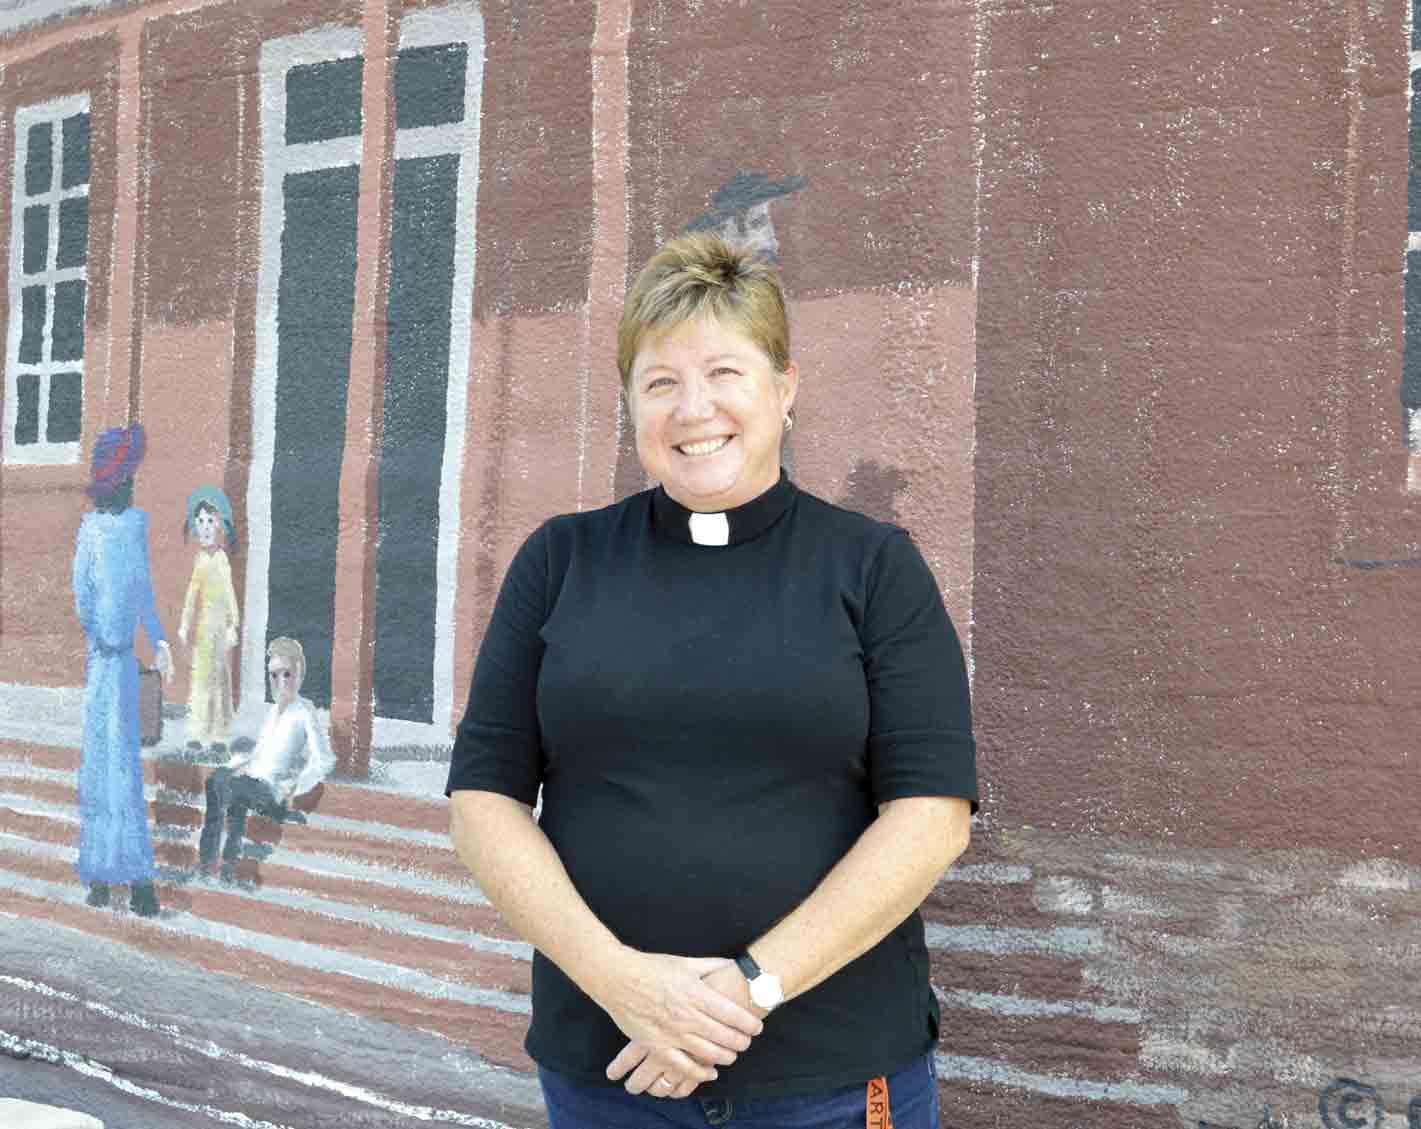 Calmar Lutheran Church recently welcomed its new pastor, Anita Neutzman, to the community. Neutzman began her new role with the local church on Aug. 1. (Zakary Kriener photo)'A perfect fit' for NeutzmanZakary KrienerNews Writerzkriener@...